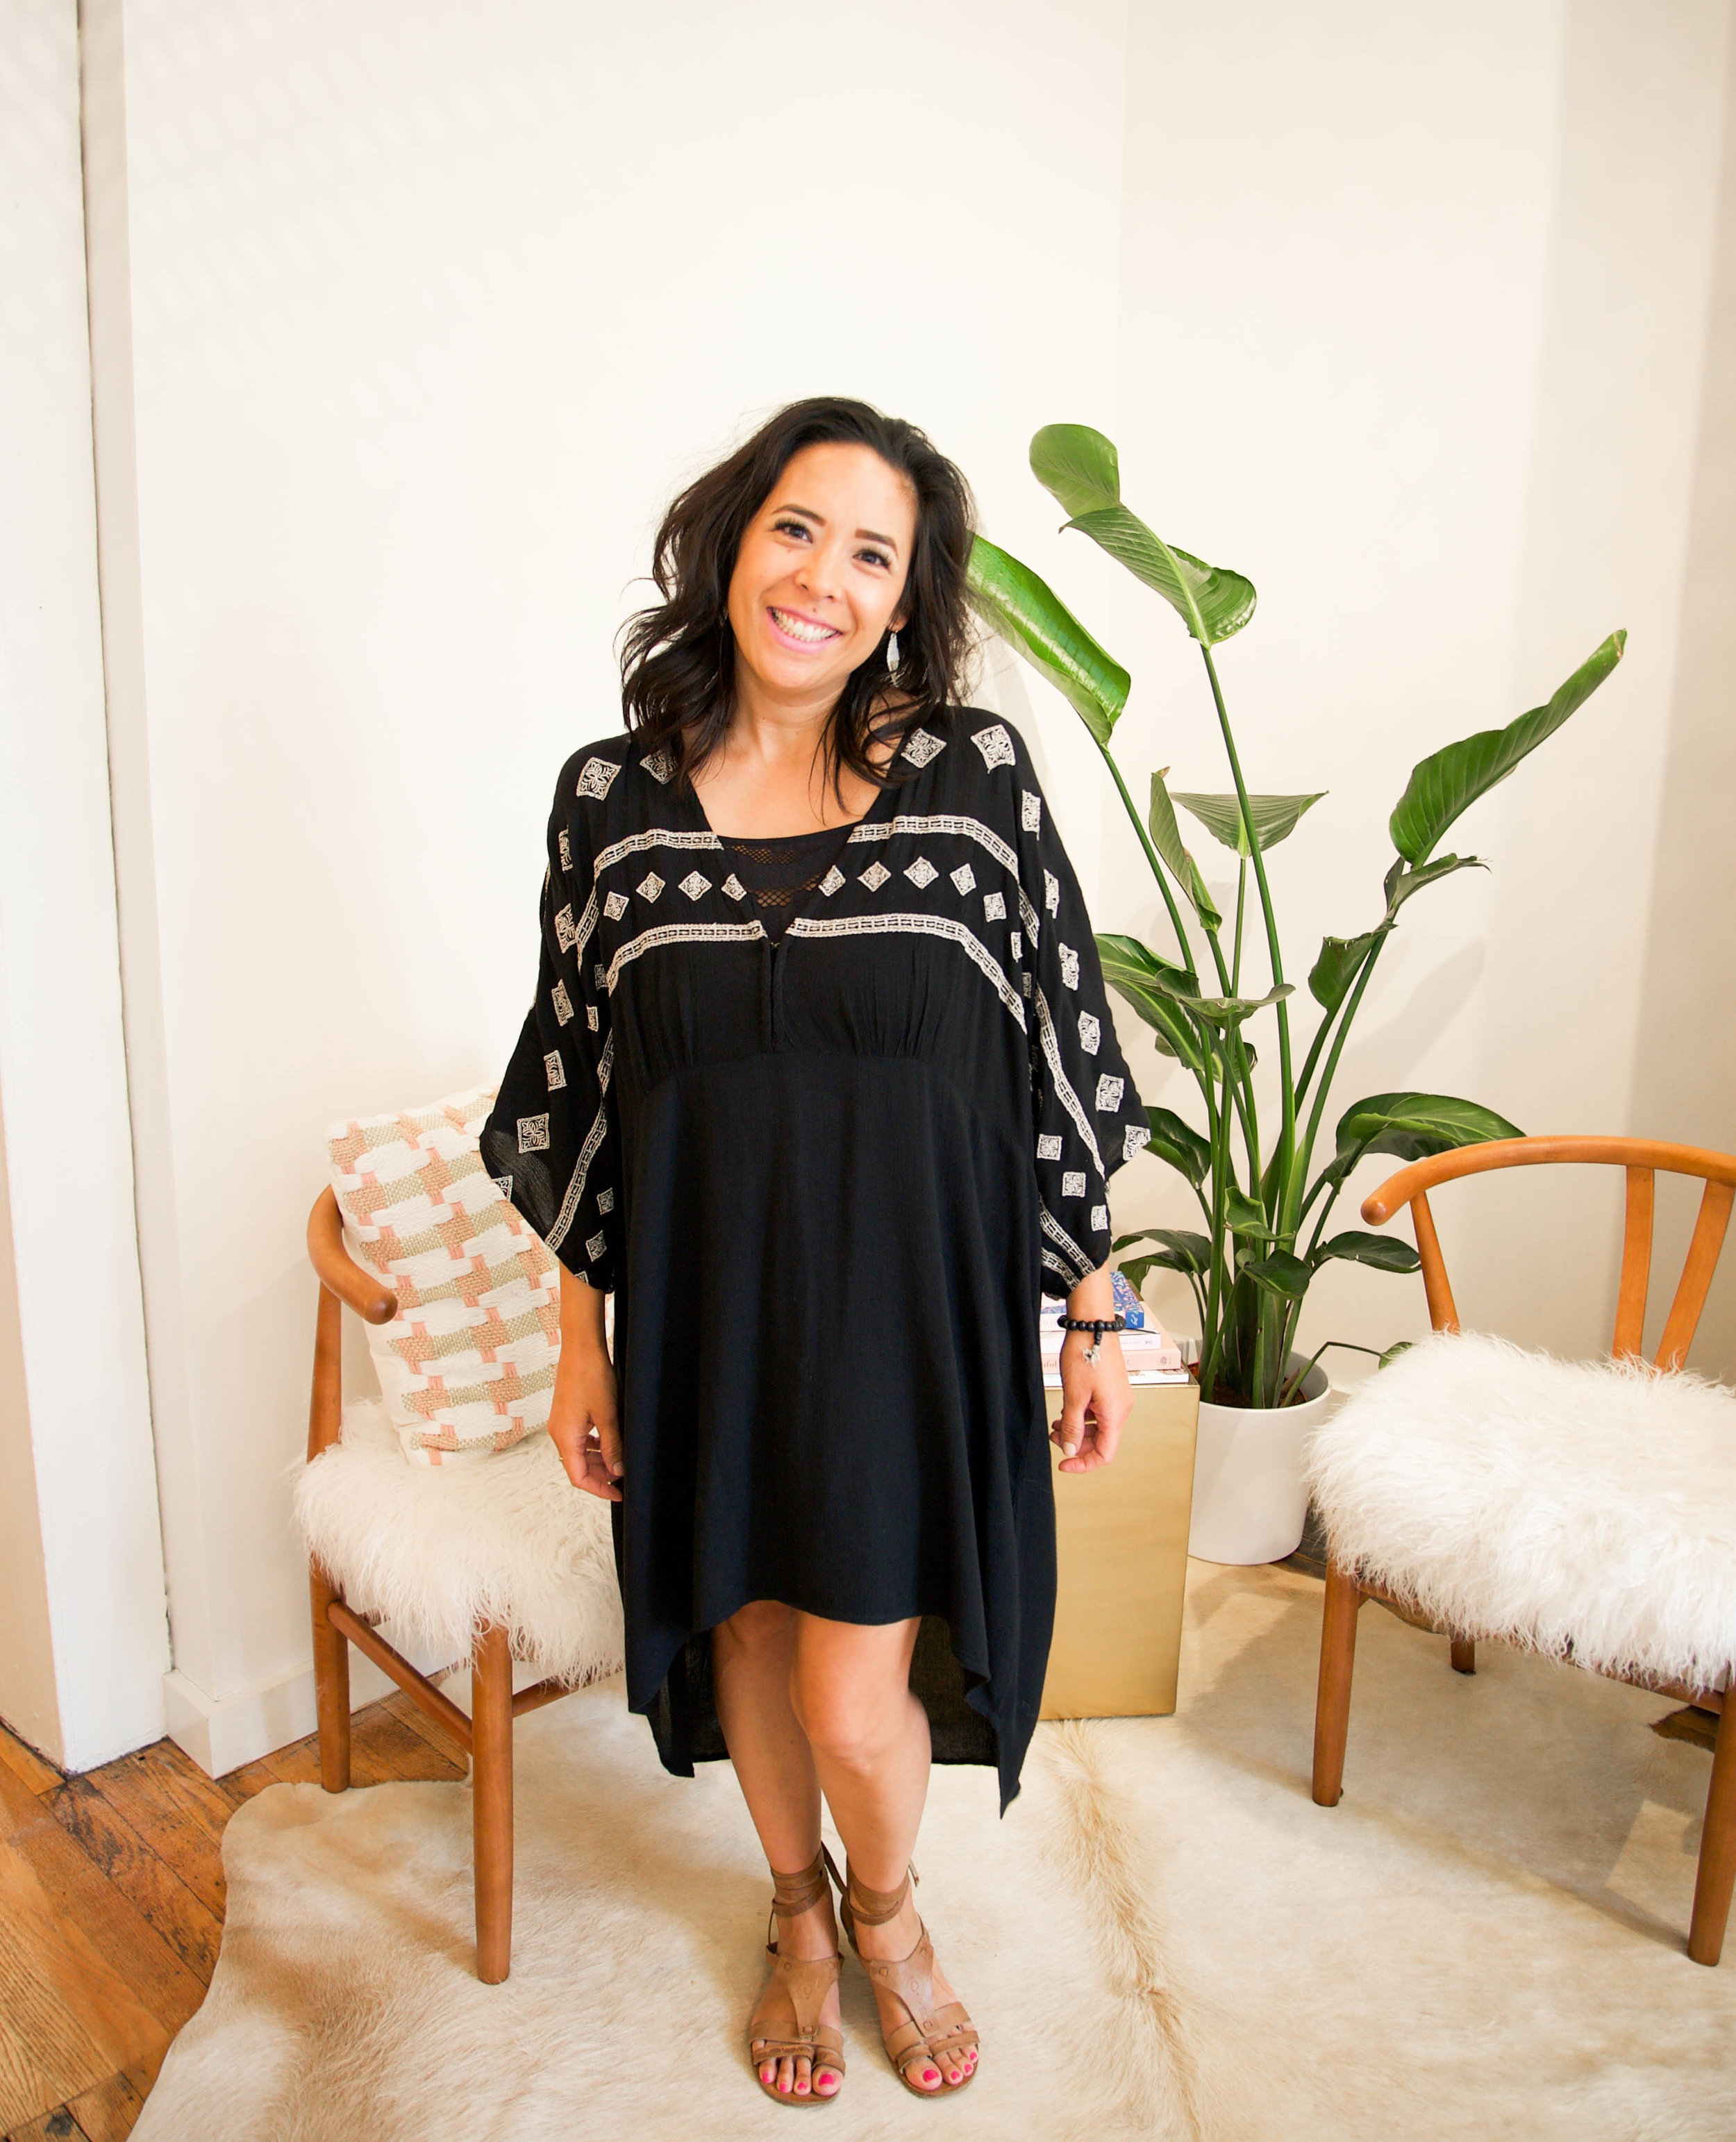 Rebecca Carrera of Maven Beauty Bar